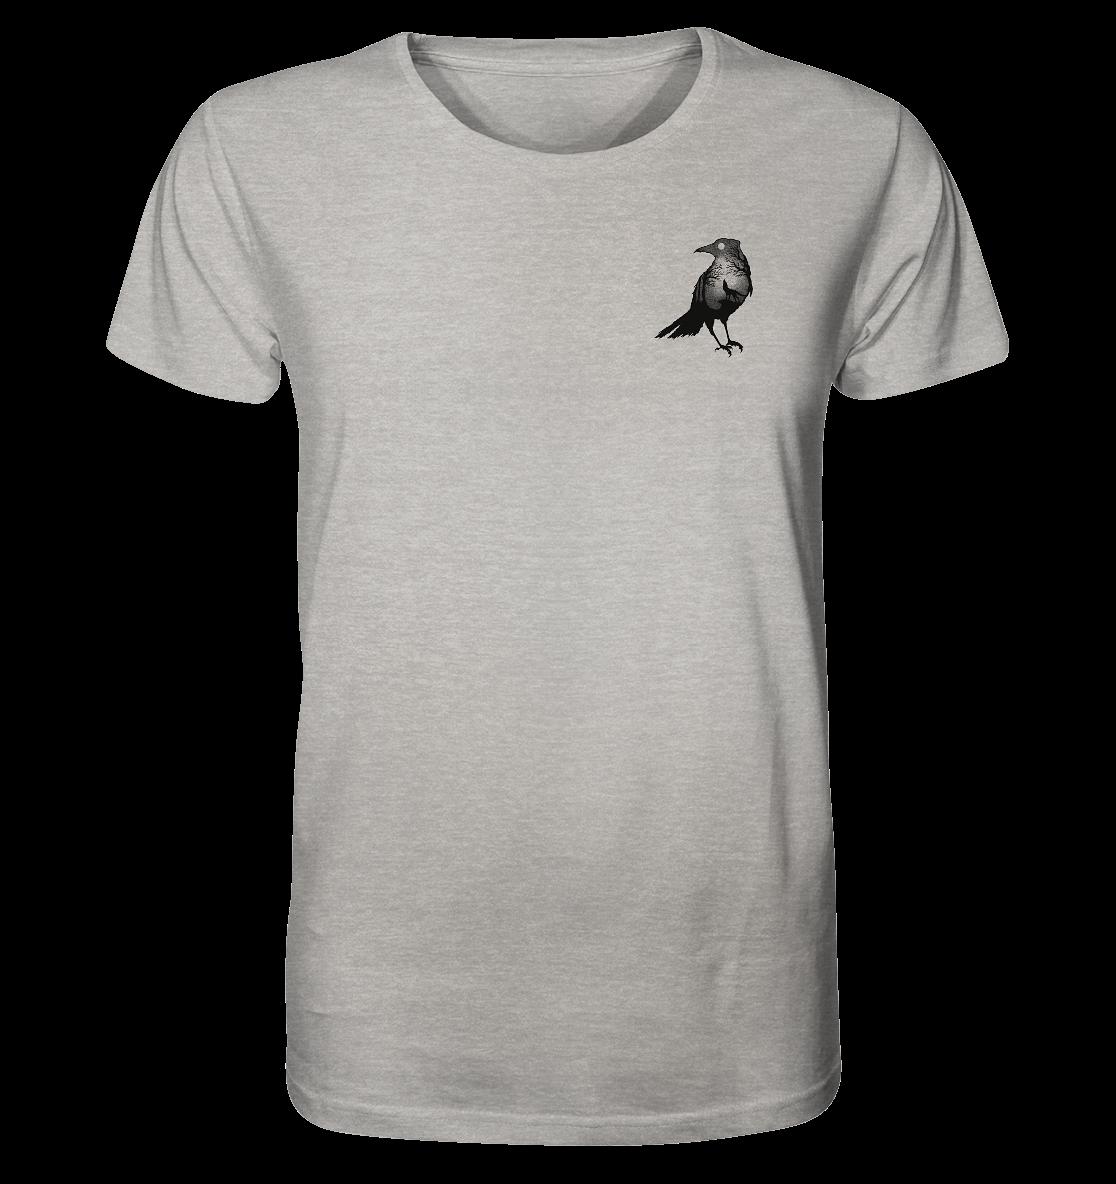 front-organic-shirt-meliert-c2c1c0-1116x-5.png